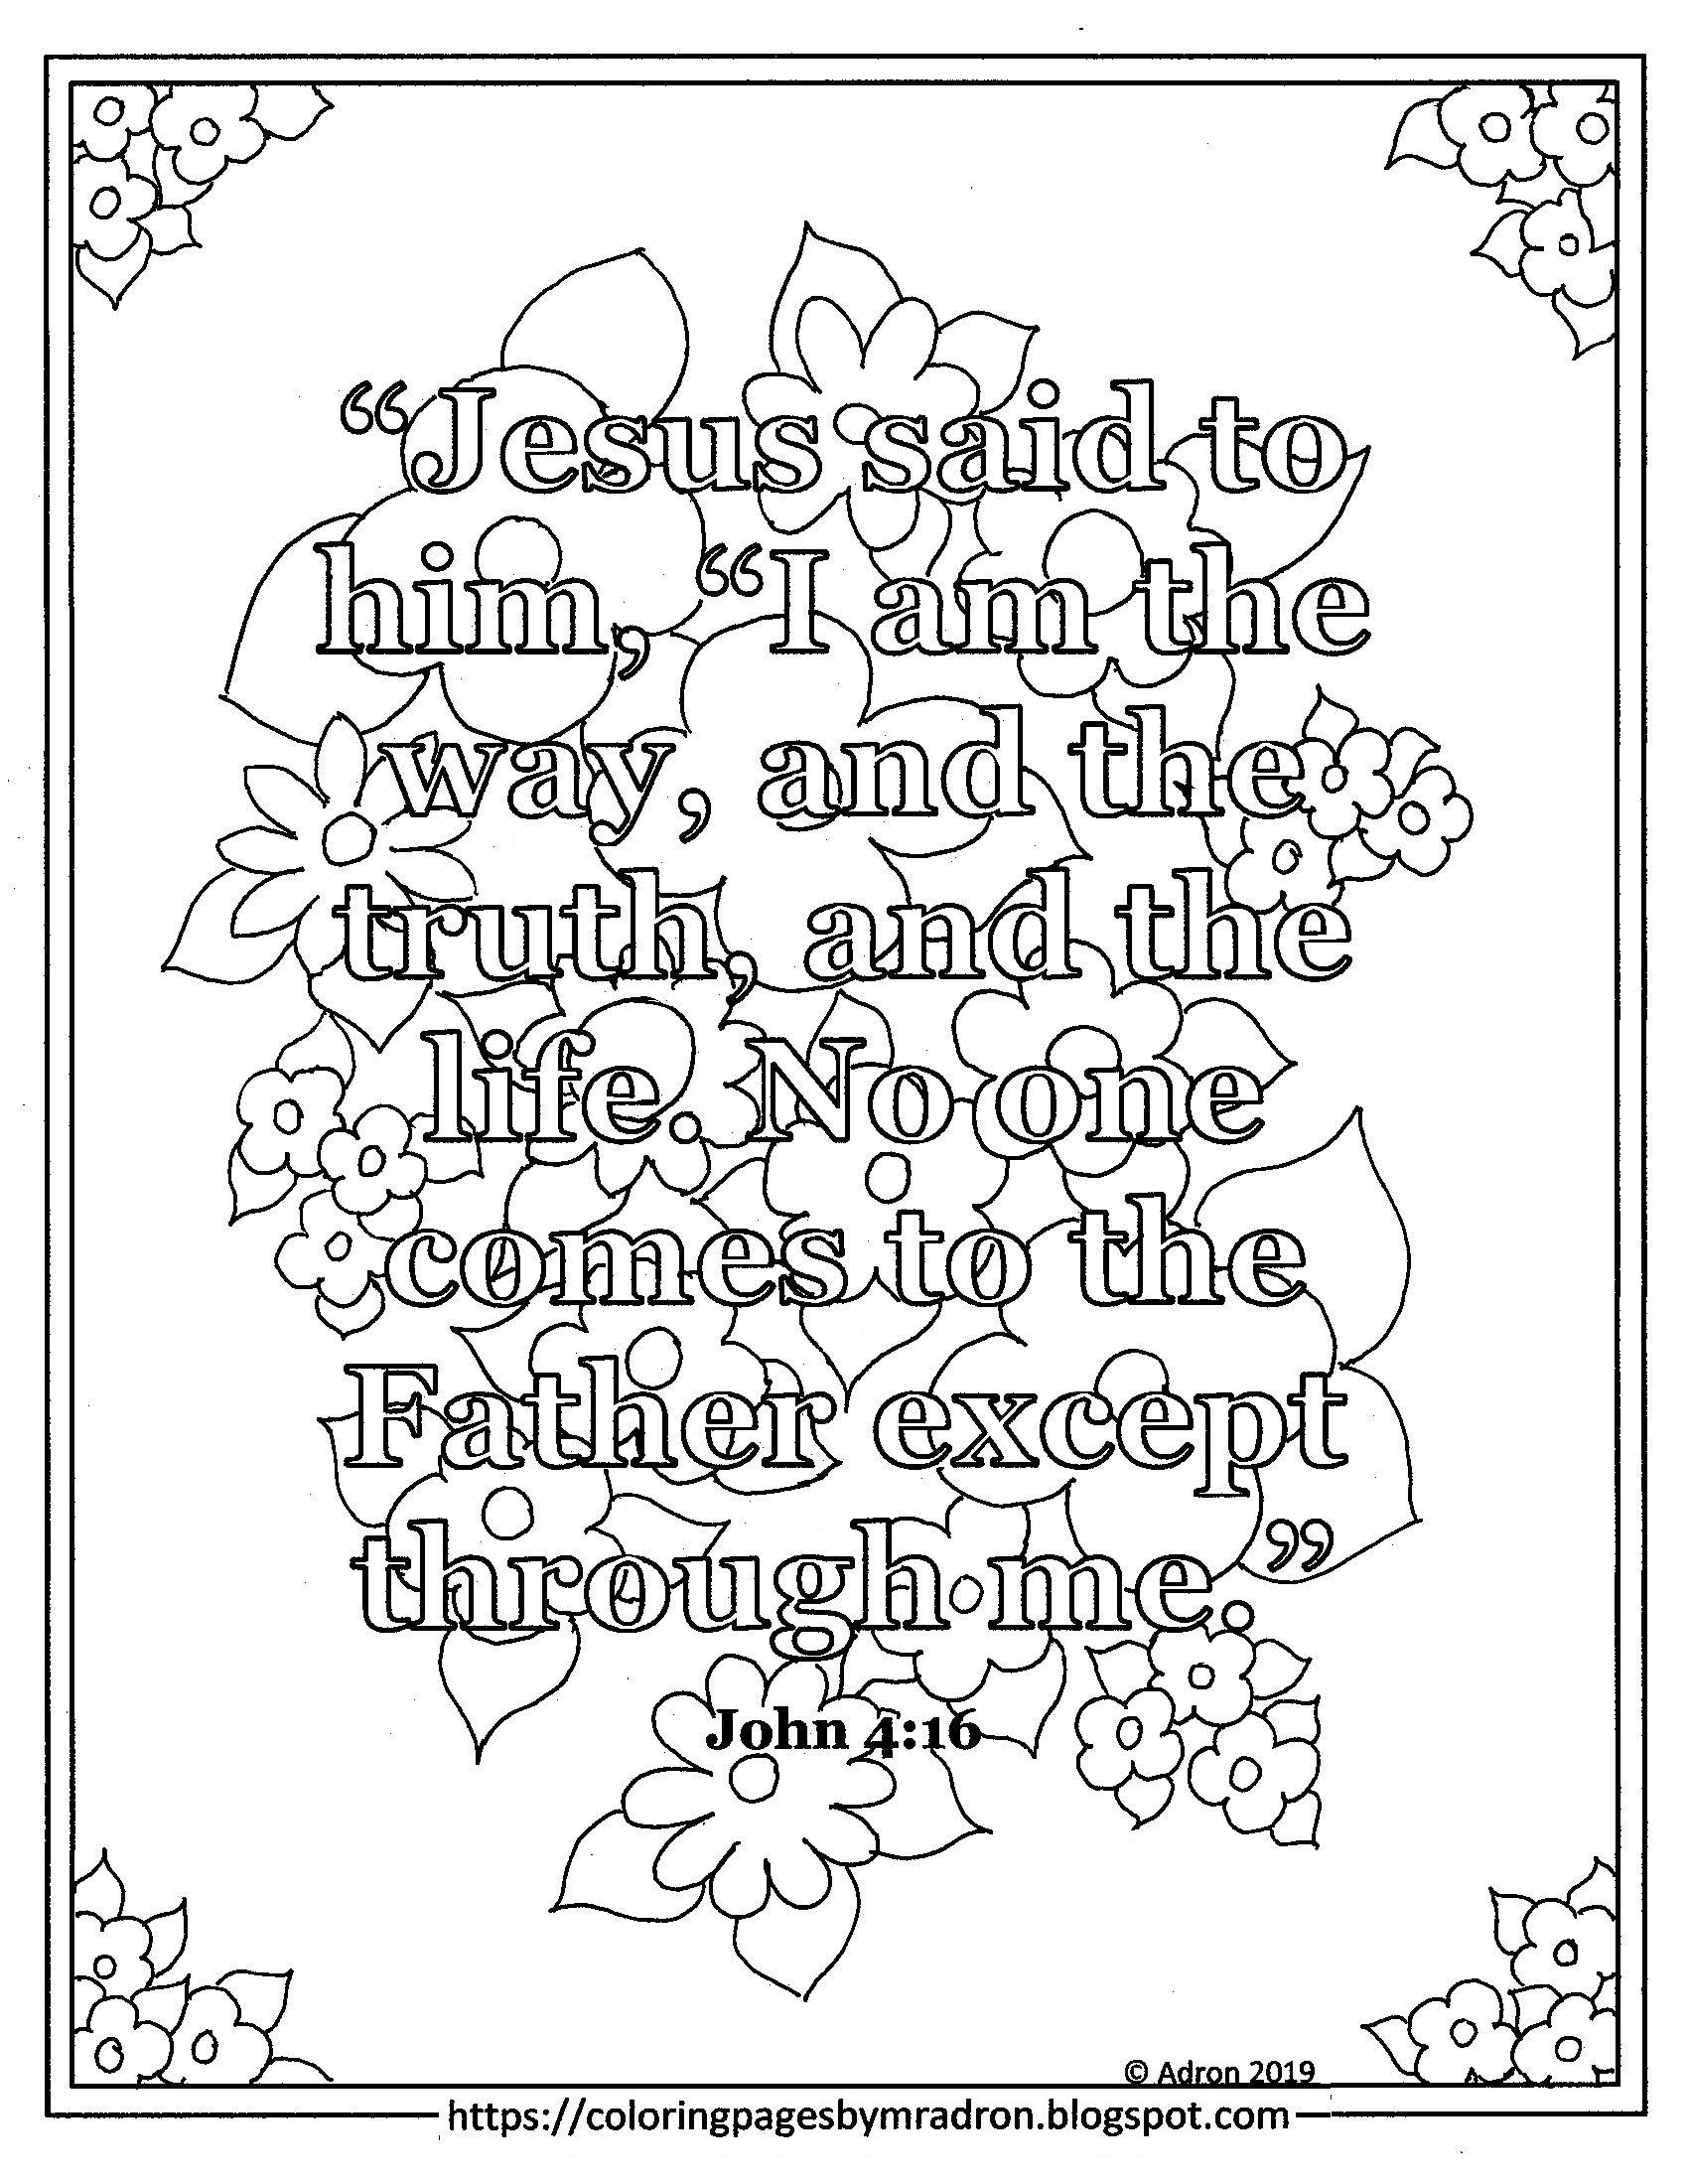 Free John John 14 6 Ash Wednesday Print And Color Page